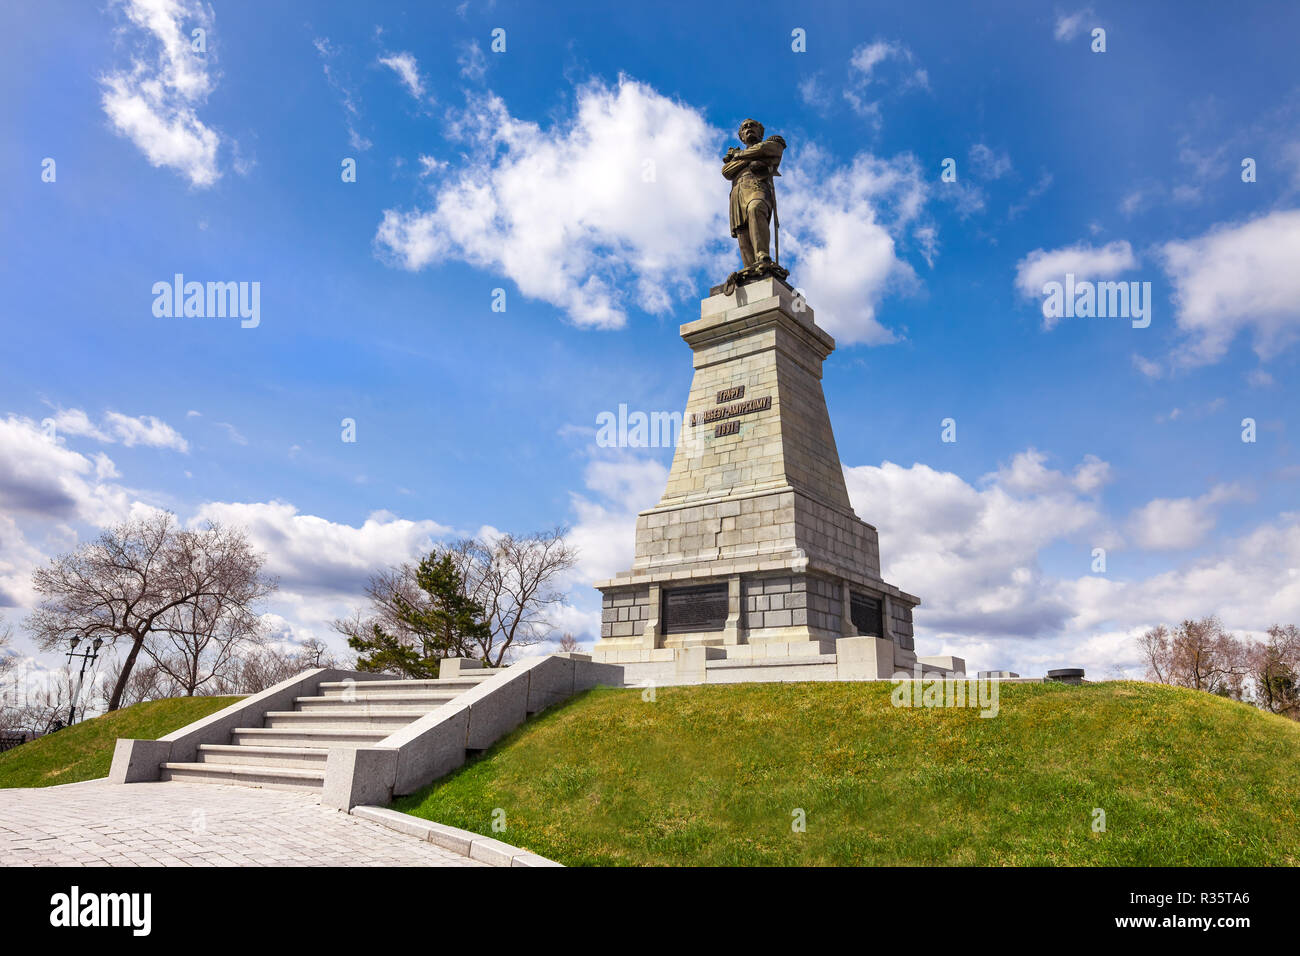 Monument to Muravyov-Amursky the founder of Khabarovsk - Stock Image